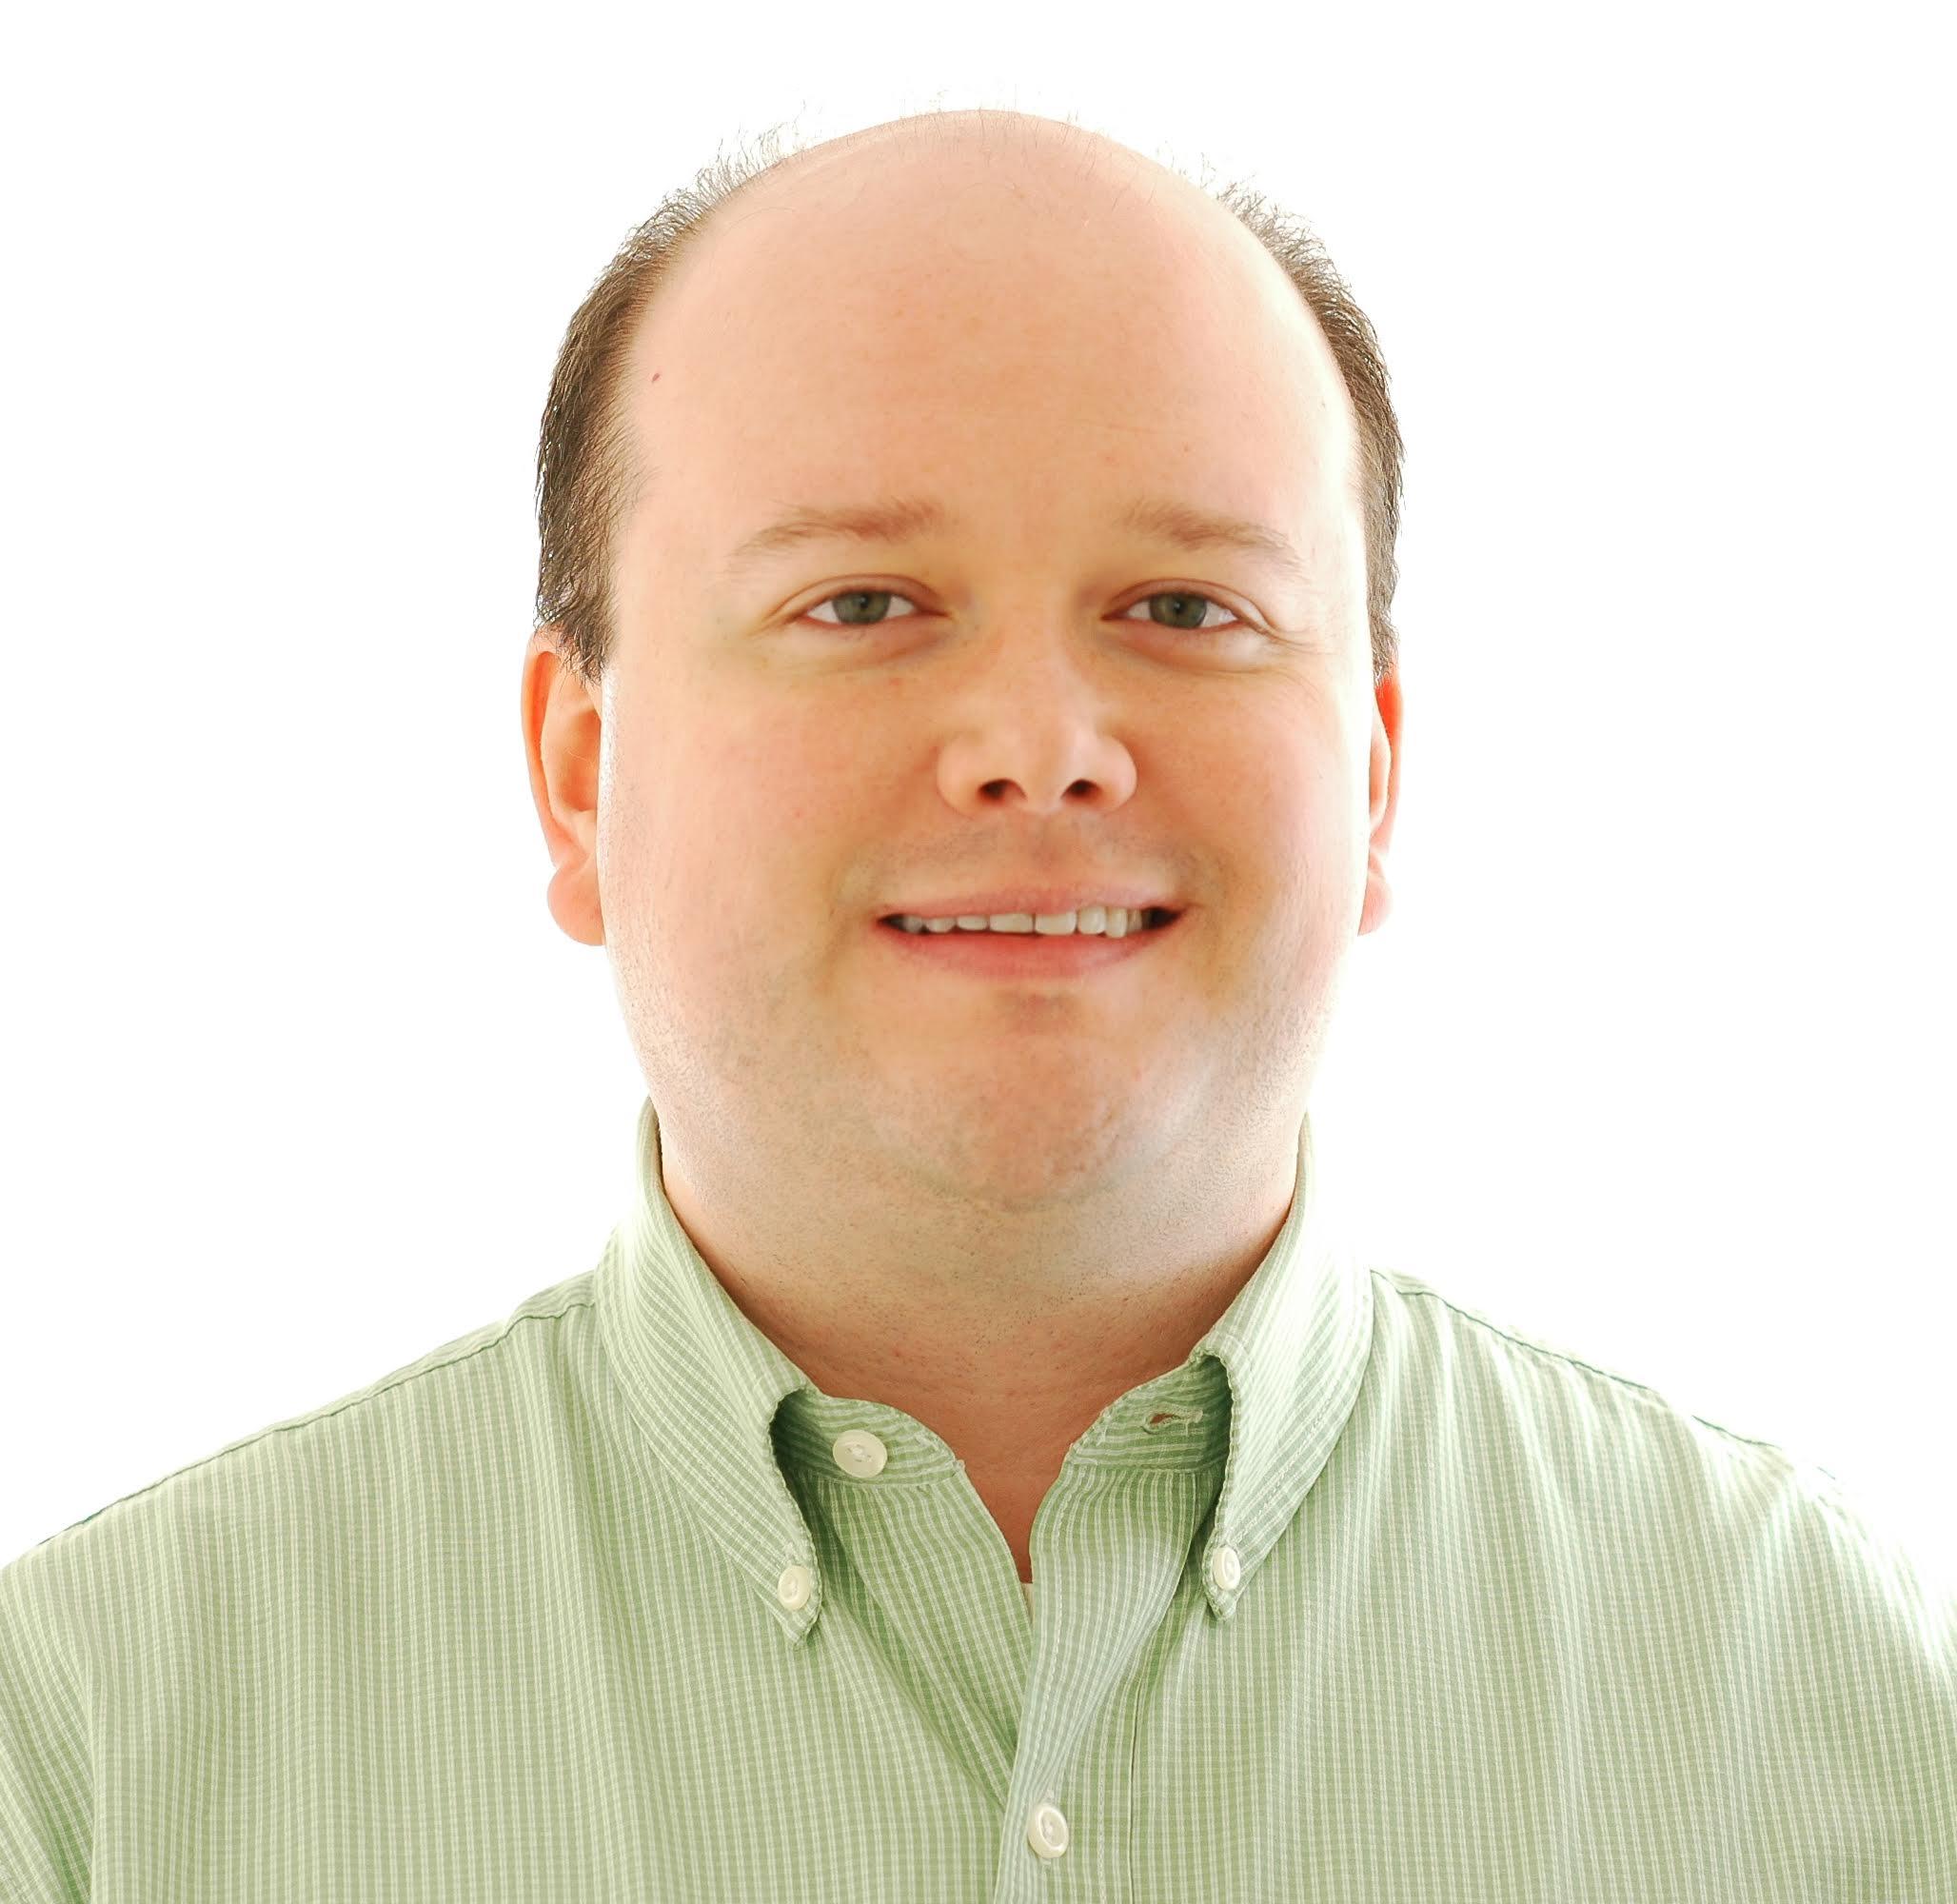 Gavin T. Ales